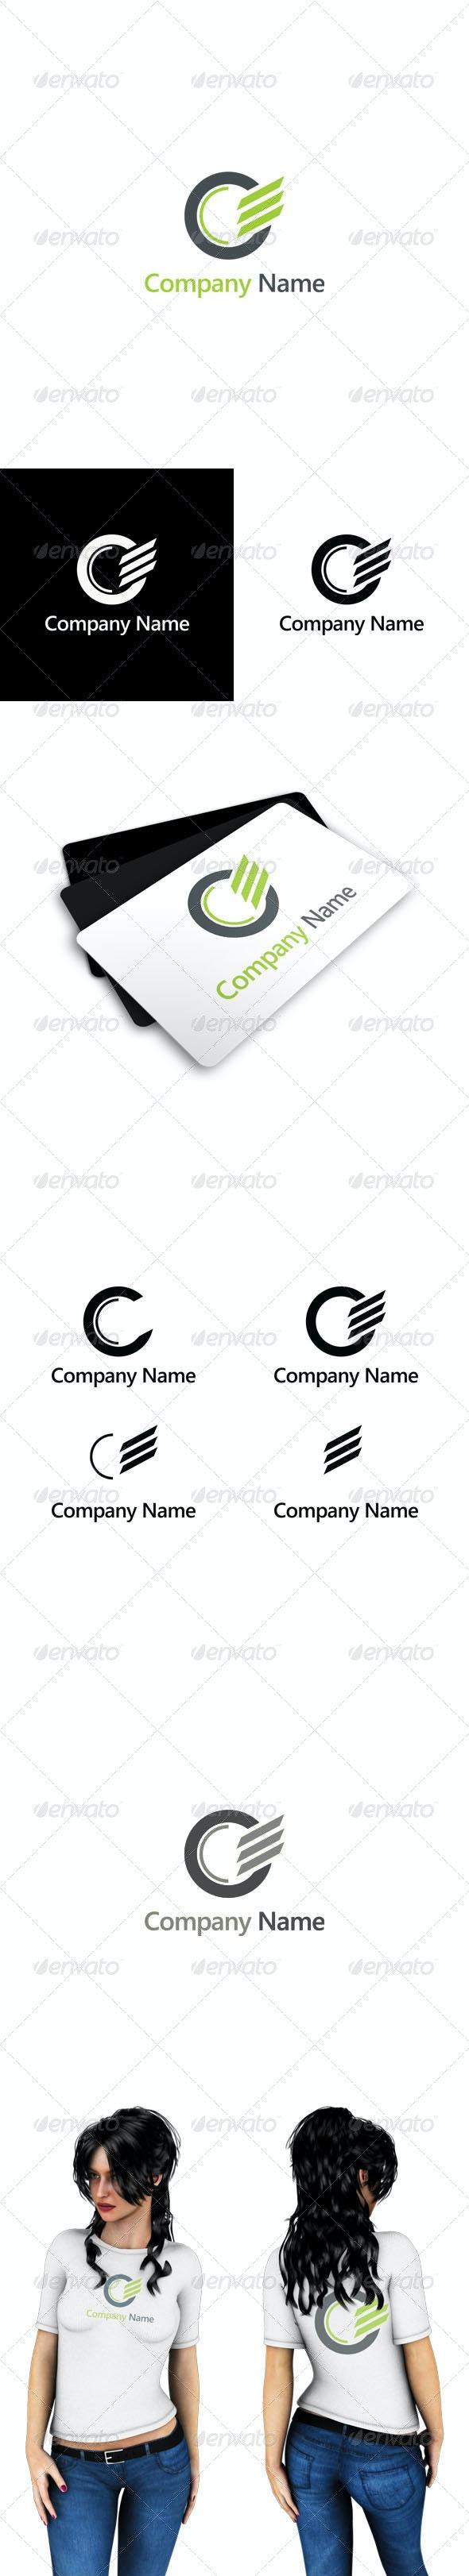 Abstract Logo - 001 - Vector Abstract